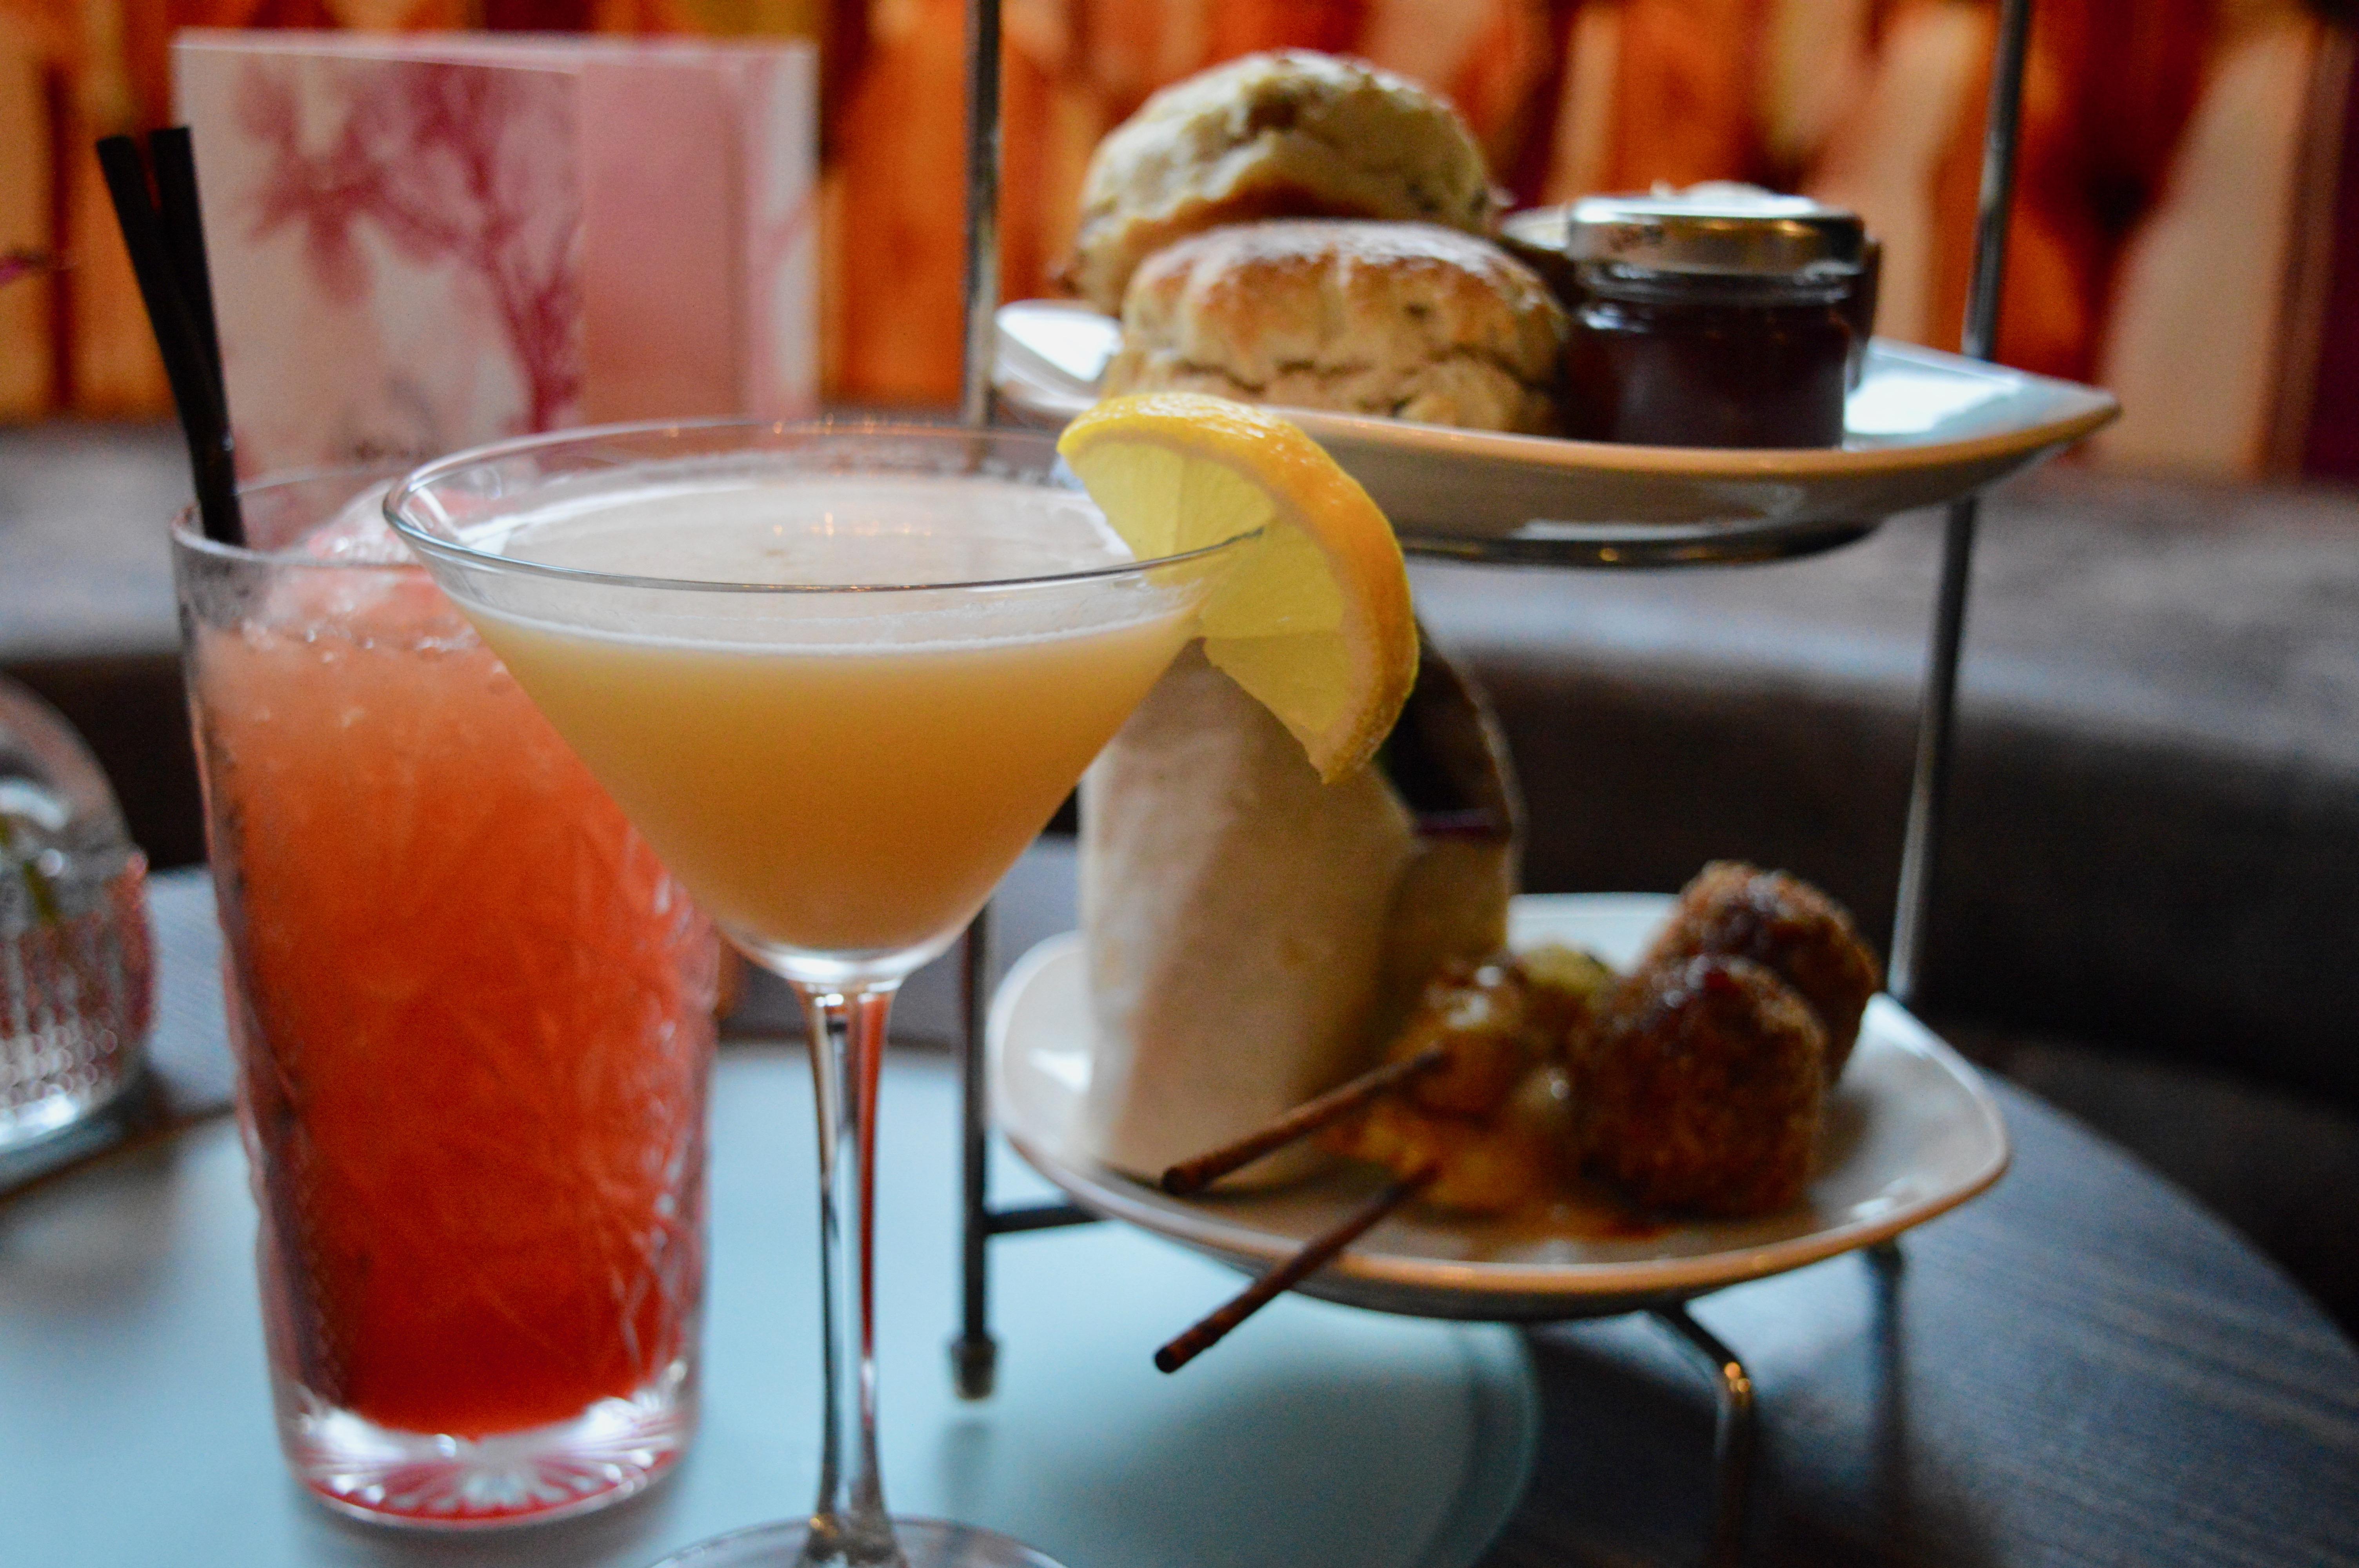 Cocktails-SoHe-Cocktail-Bar-Asian-Restaurant-Jesmond-Newcastle-Elle-Blonde-Luxury-Lifestyle-Blog